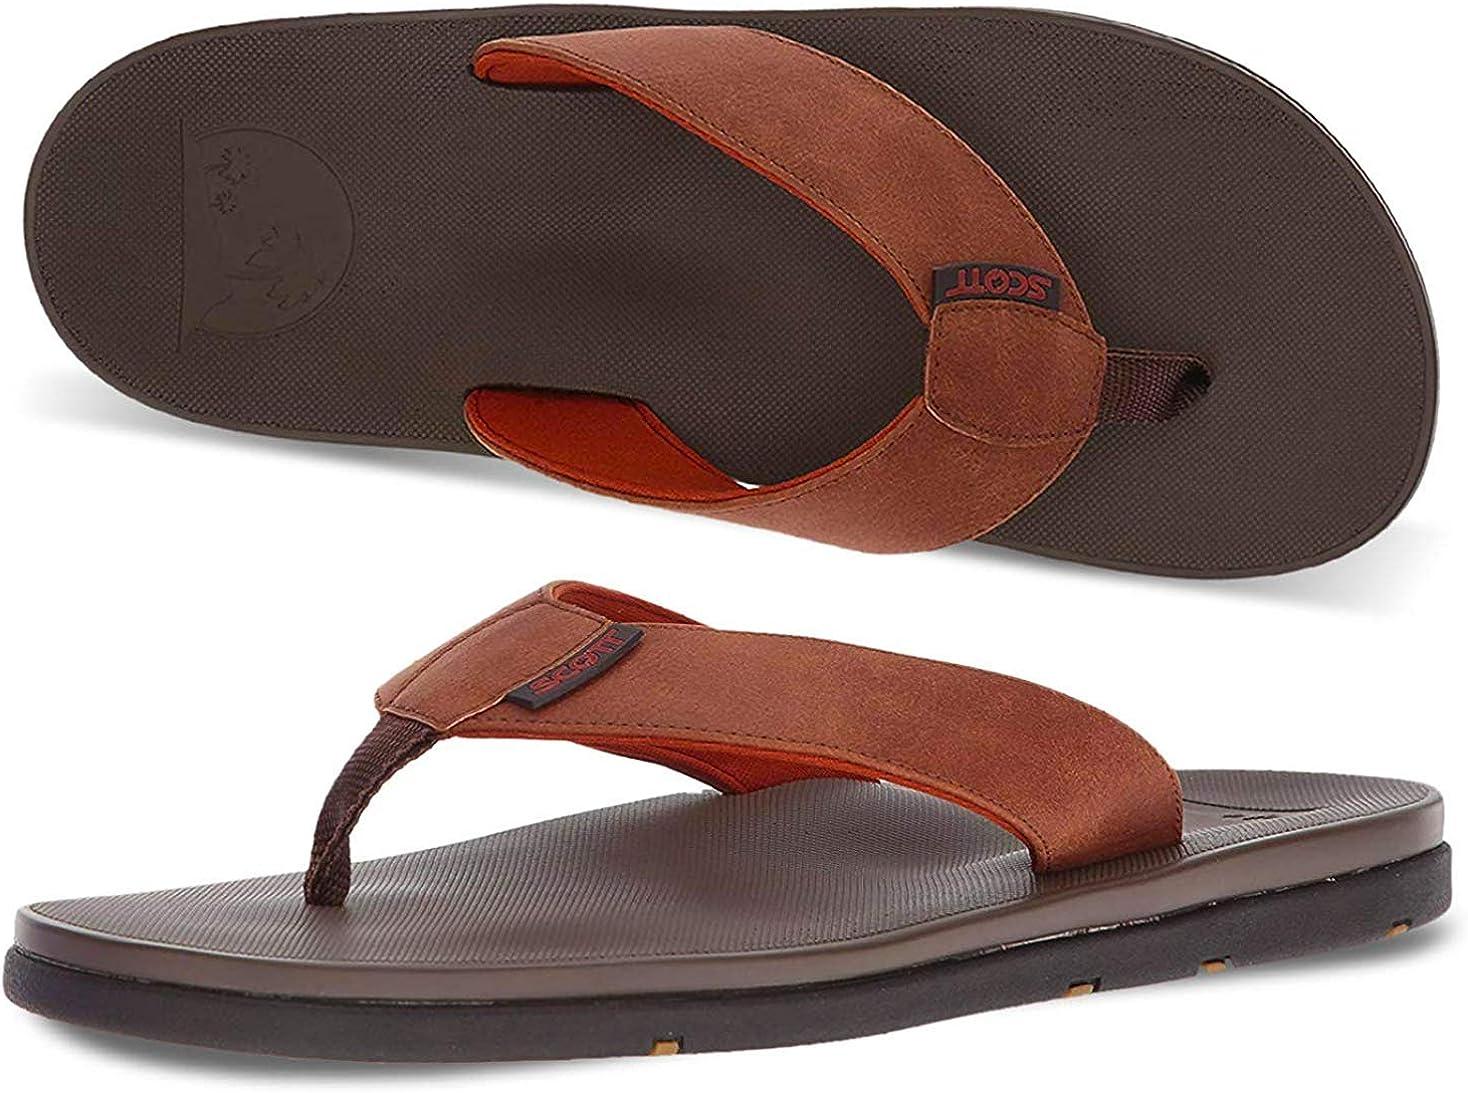 Scott Hawaii Men's Hikino Vegan Leather Sandals   Reef Walking Flip Flops for Men   Gray Brown Neoprene Comfort Waterproof Shoes   Guarantee All Day Arch Support Comfortable Slipper